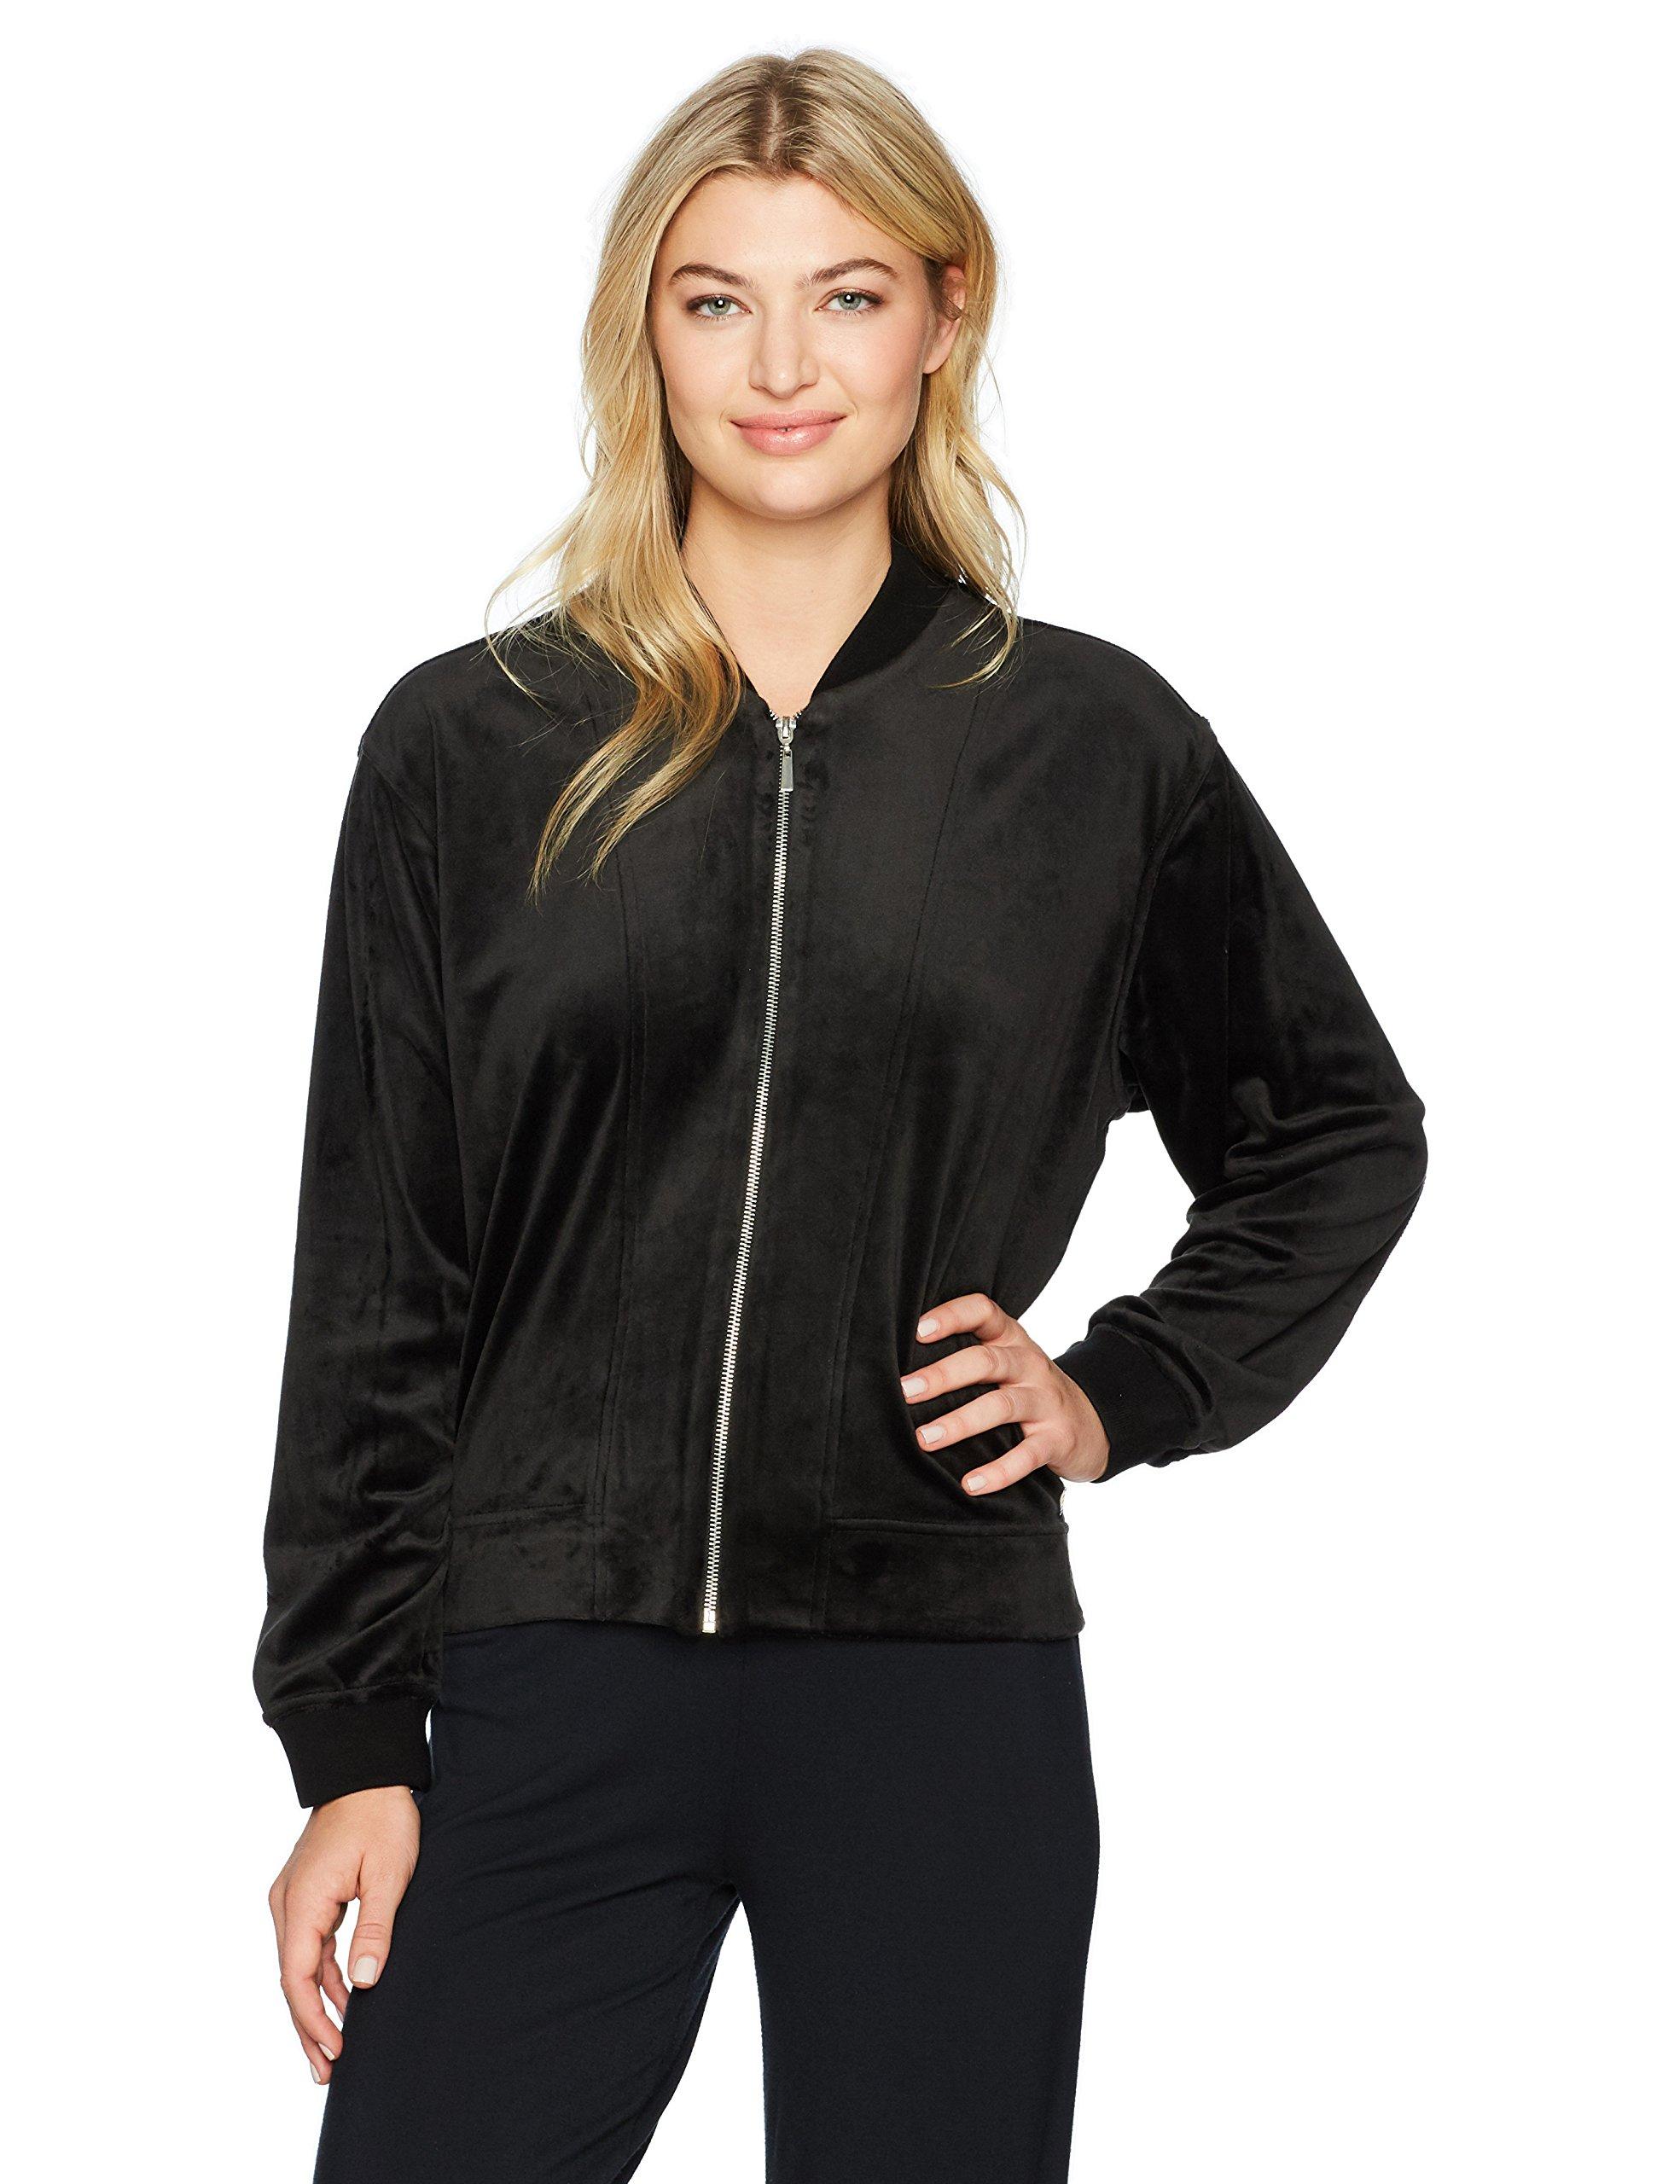 Natori Women's Luxe Velour Jacket, Black, Medium